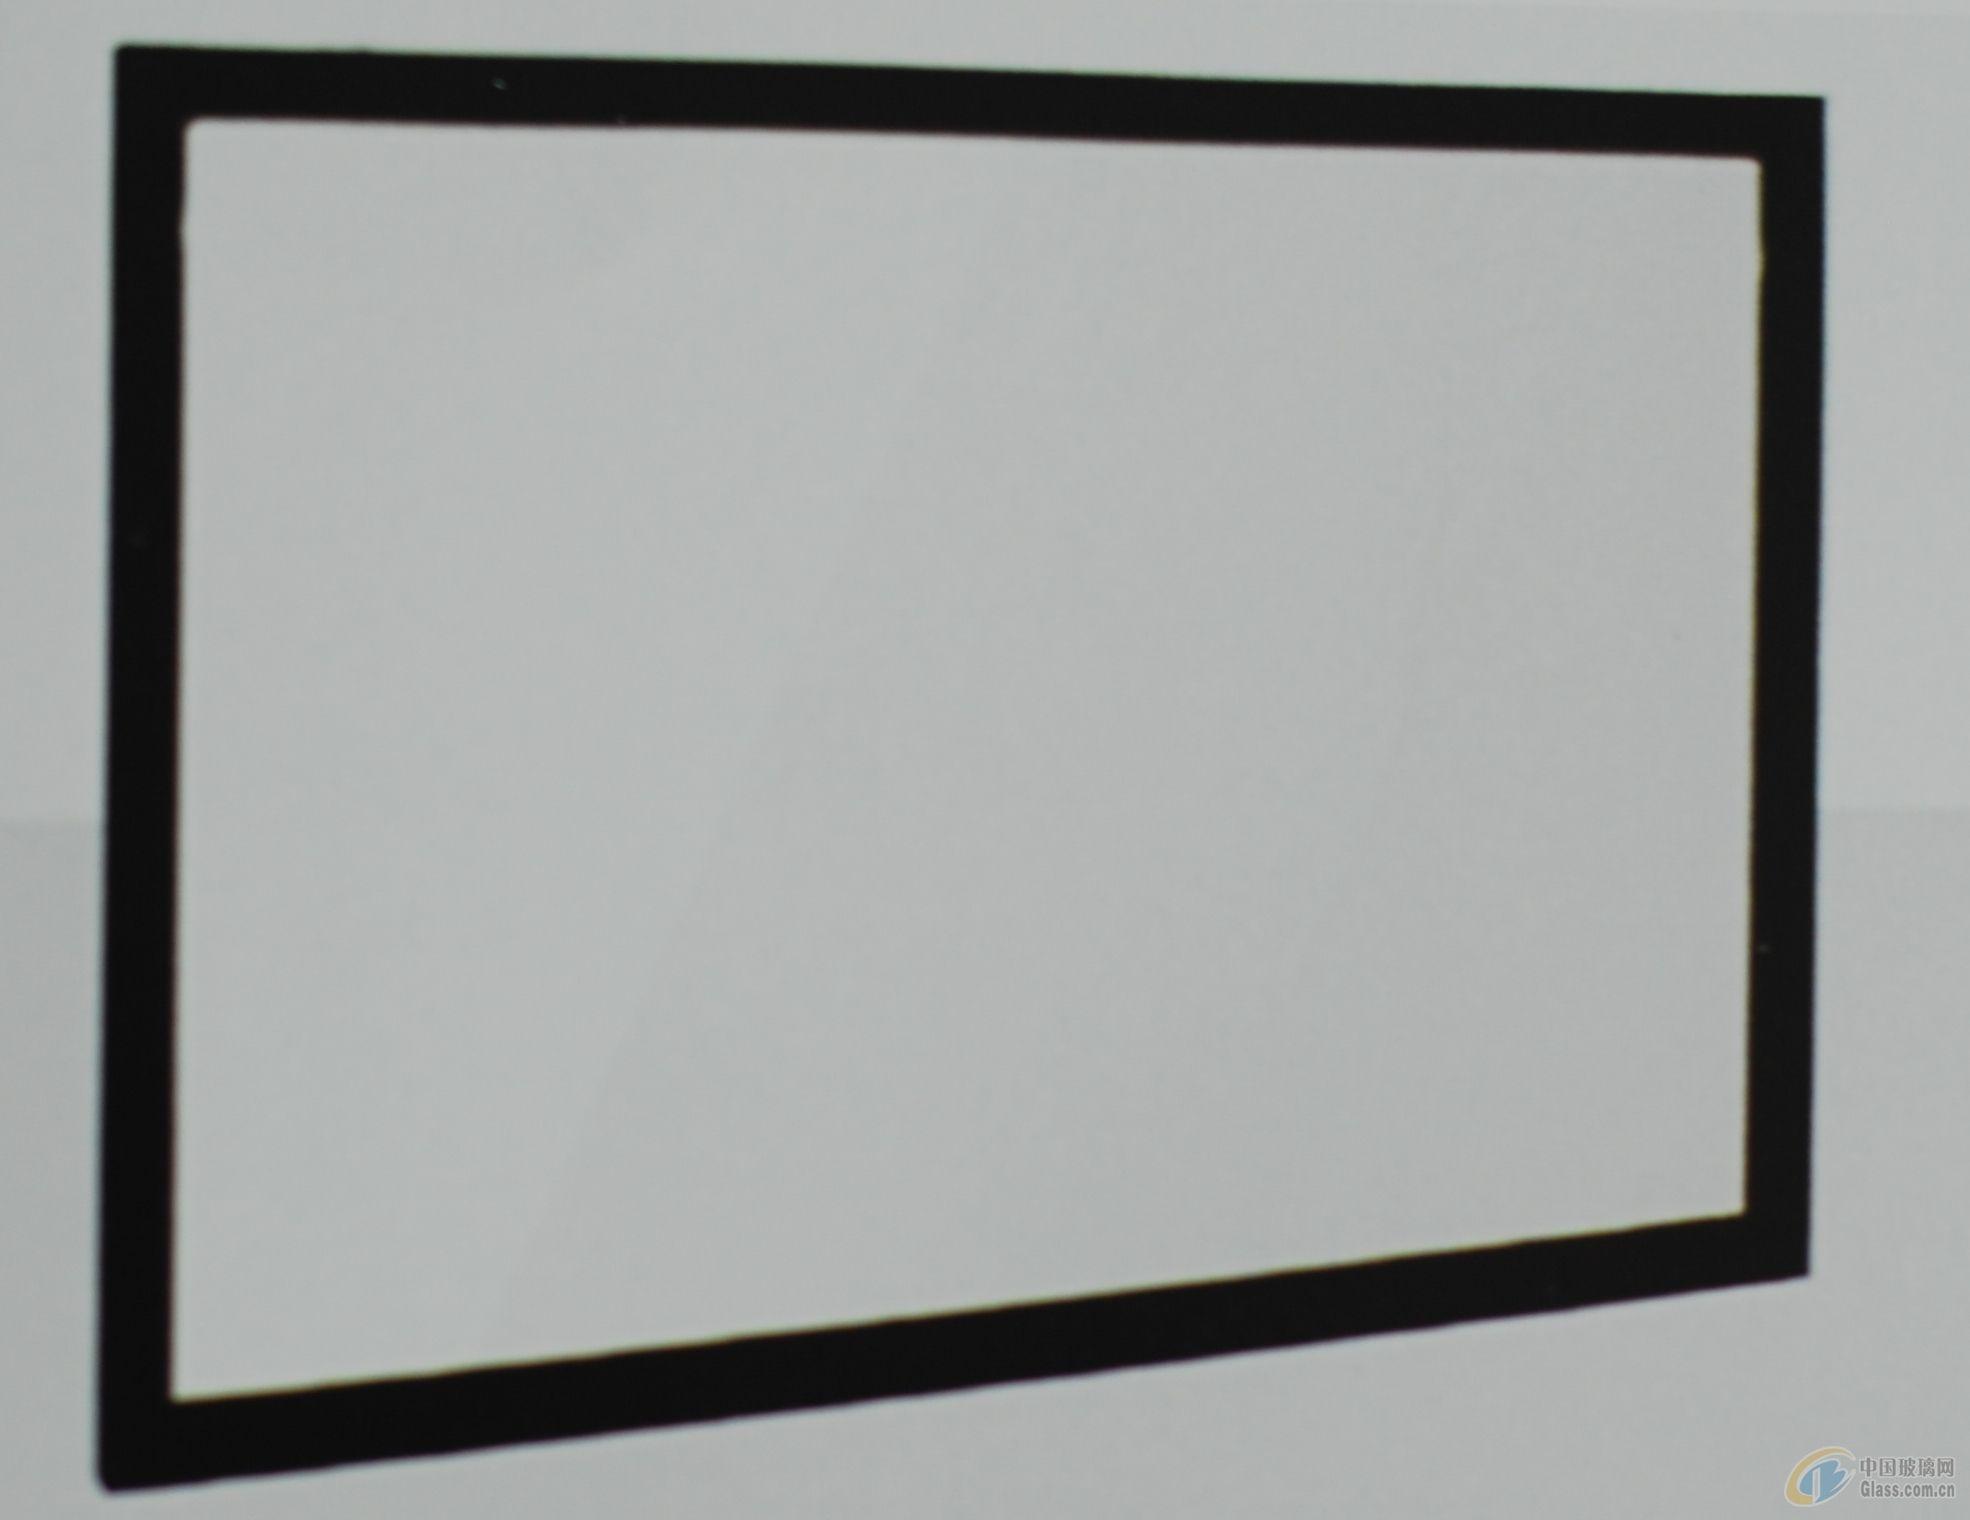 Anti glare glass/Non glare glass/anti scratch coating for screen protection